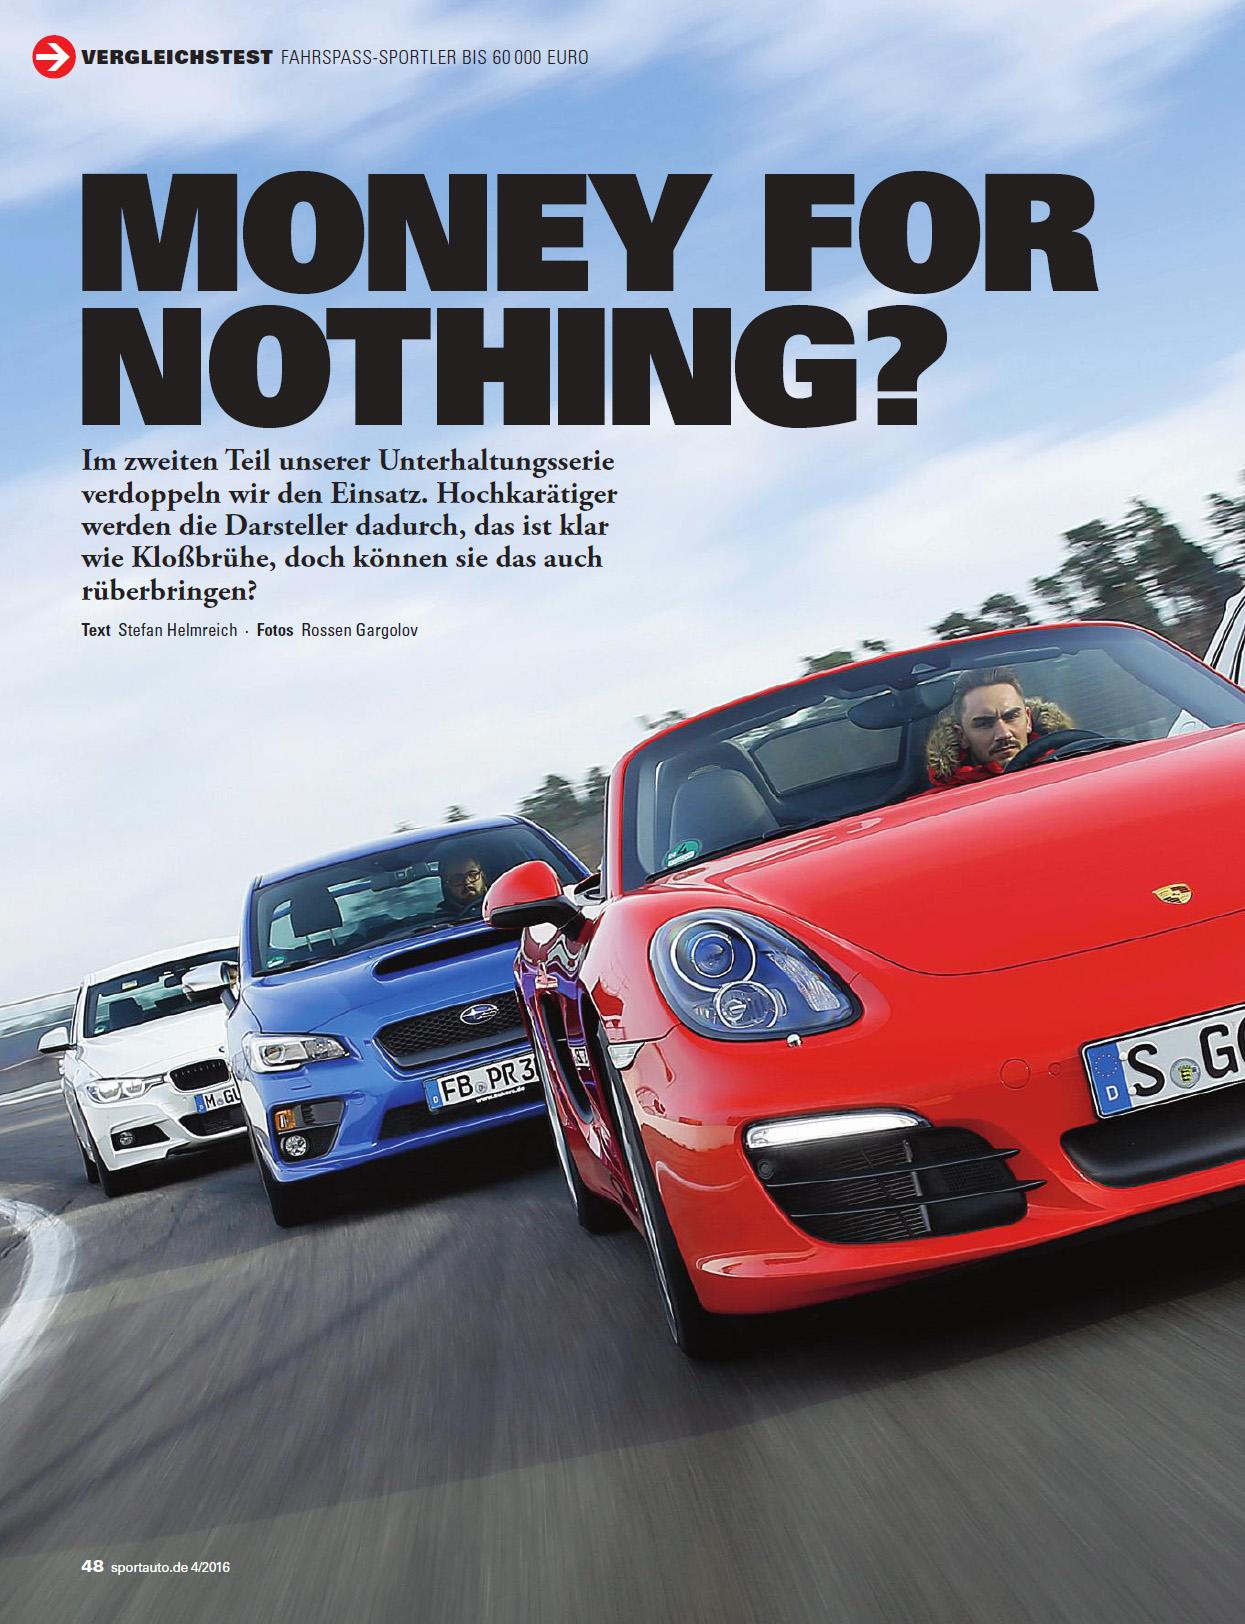 Subaru Porsche Cars History